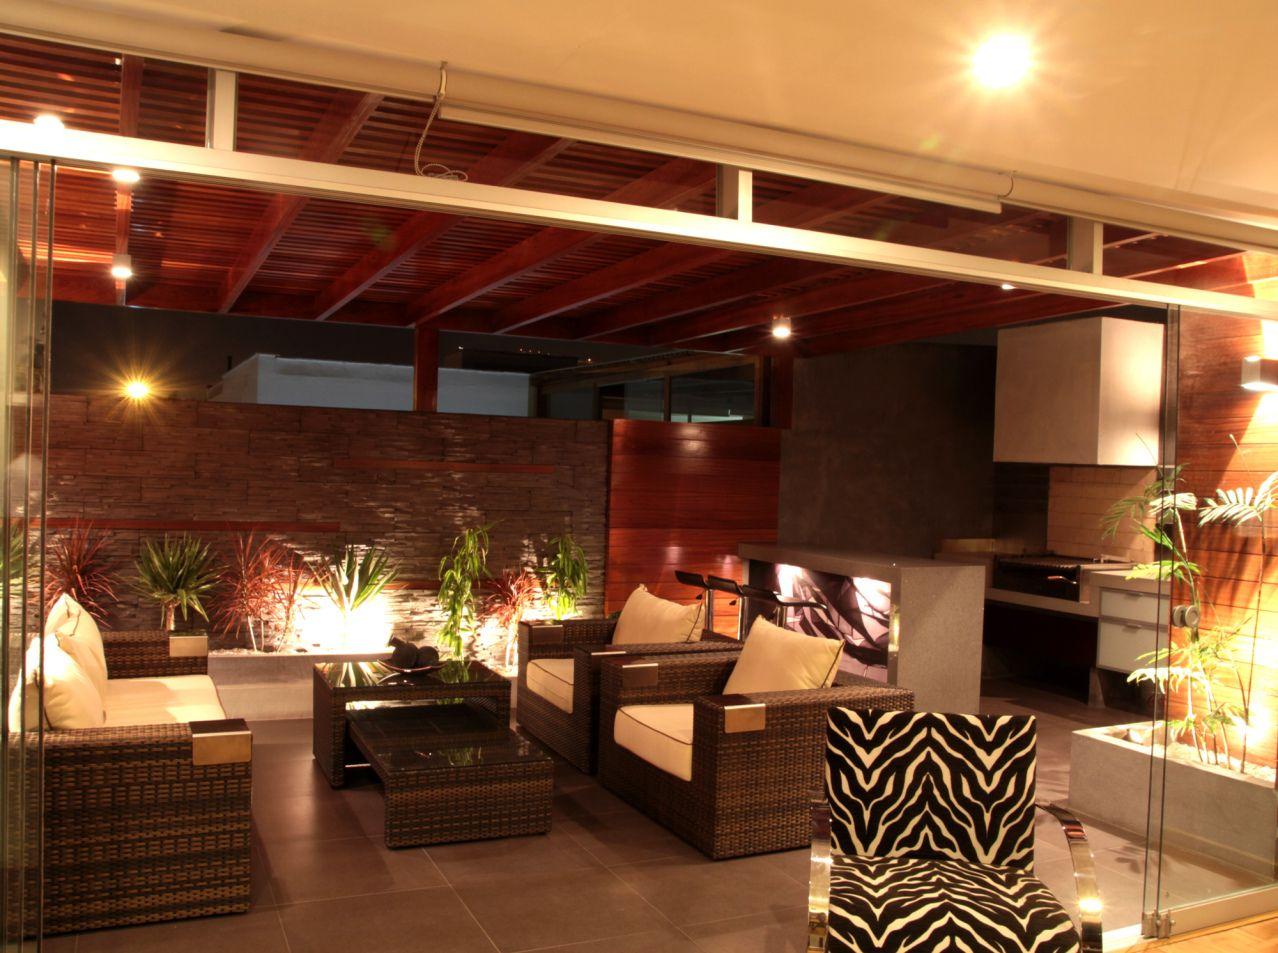 Foto cinco alianys iluminaci n iluminaci n terrazas y for Iluminacion minimalista interiores